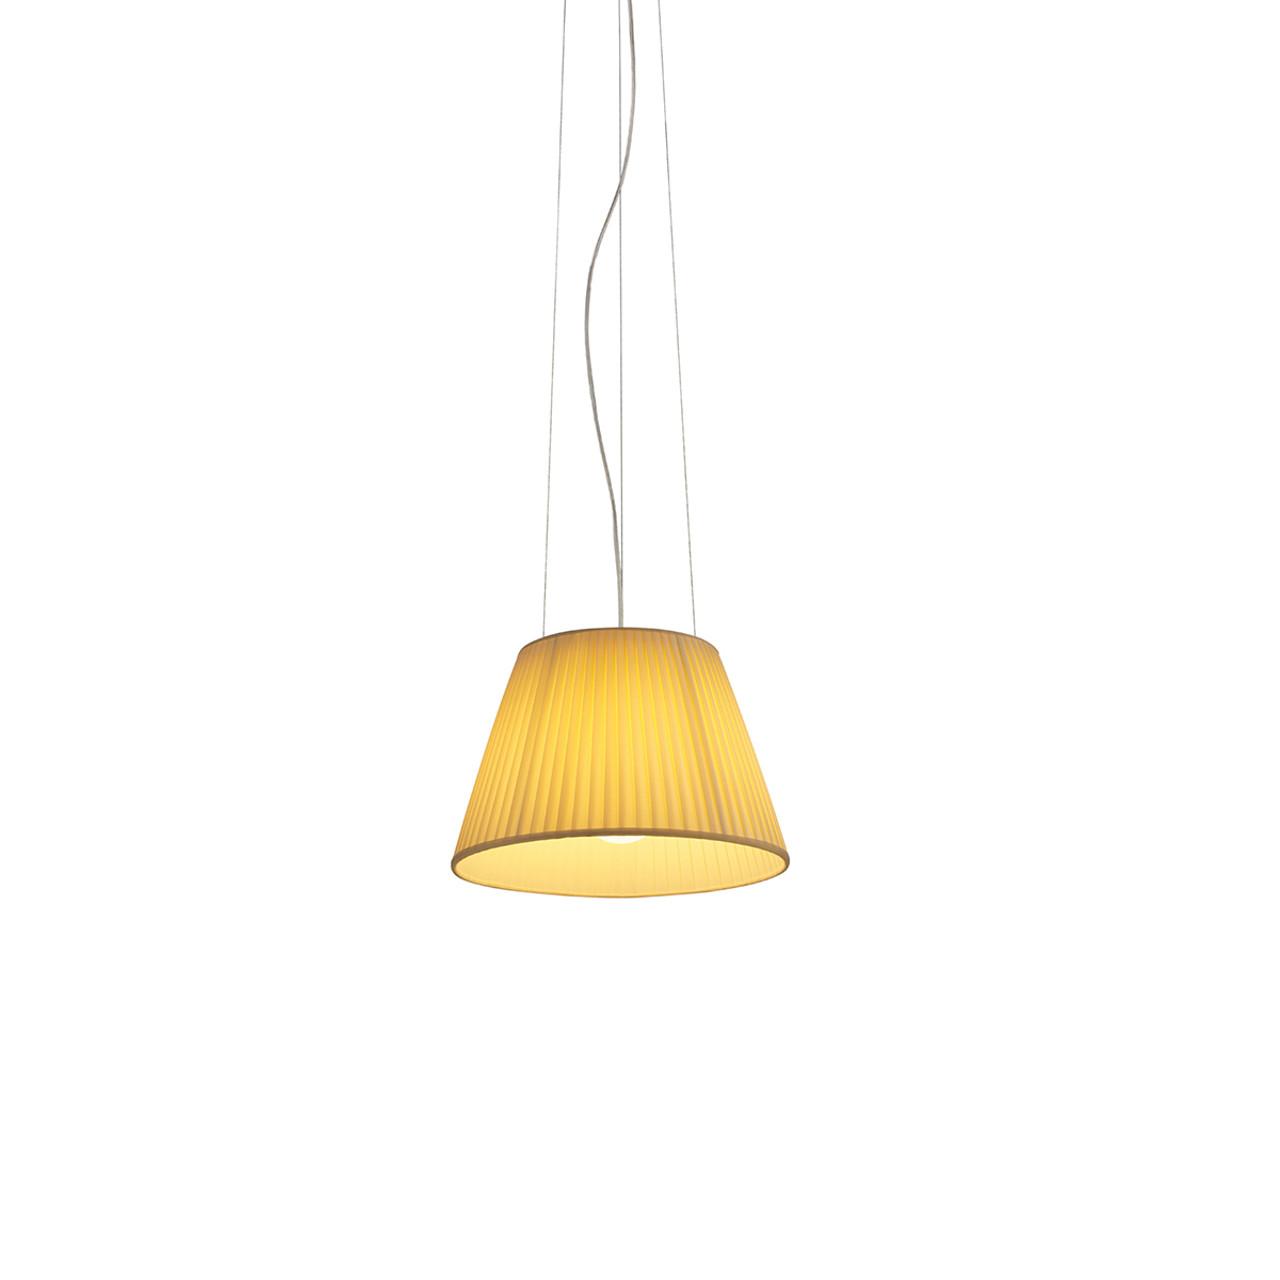 Romeo Soft Modern Pendant Light On Sale By Starck Flos Usa